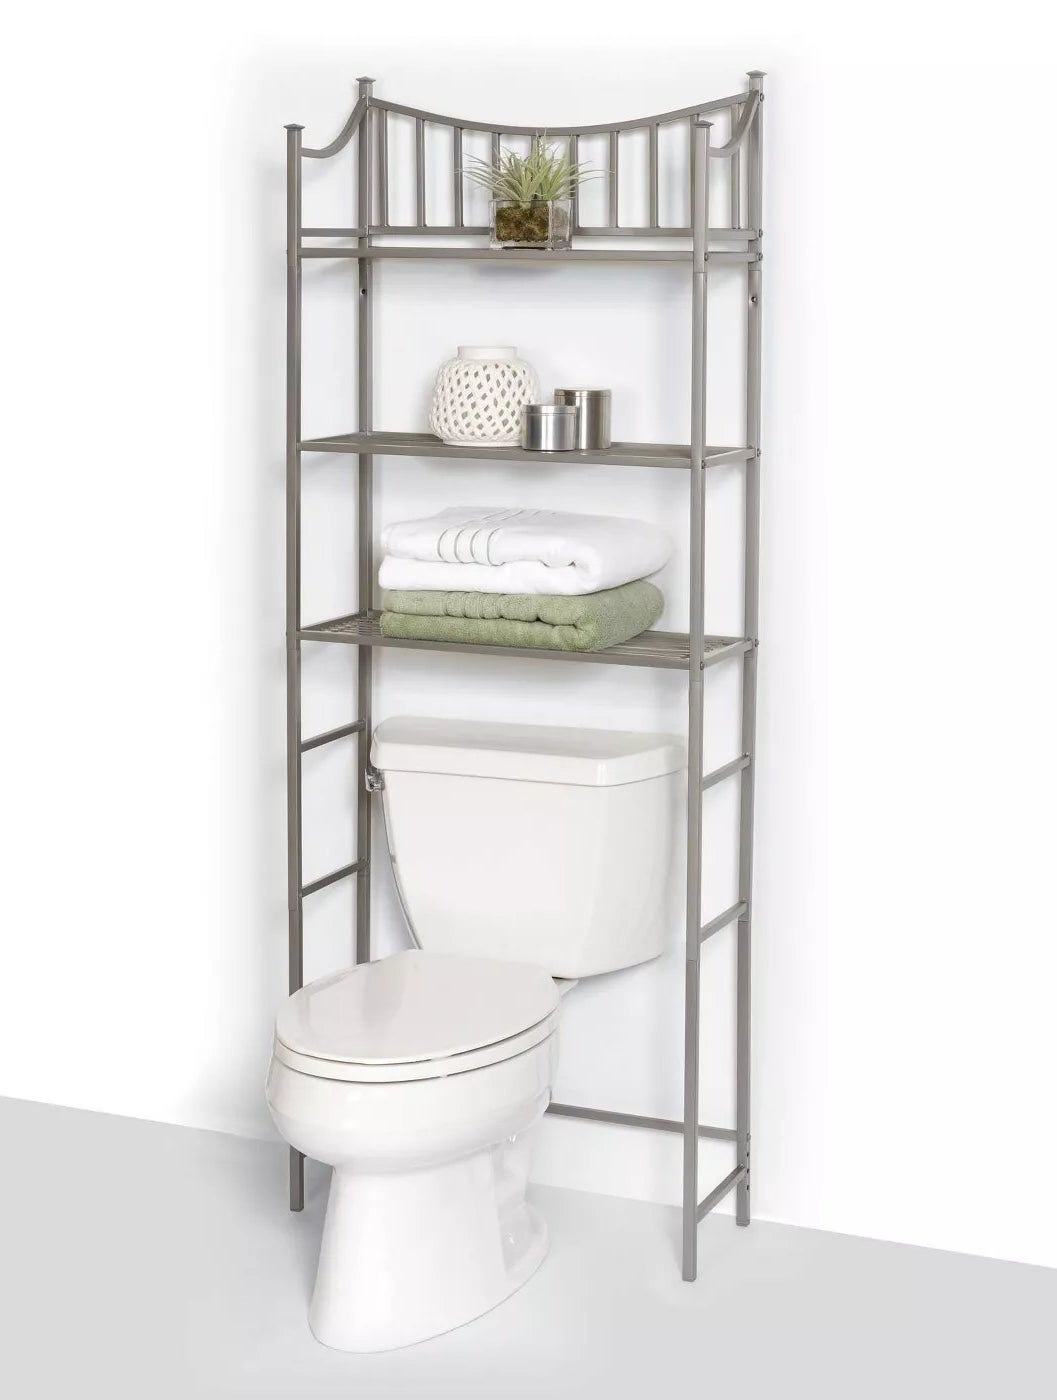 A spacesaver for bathroom